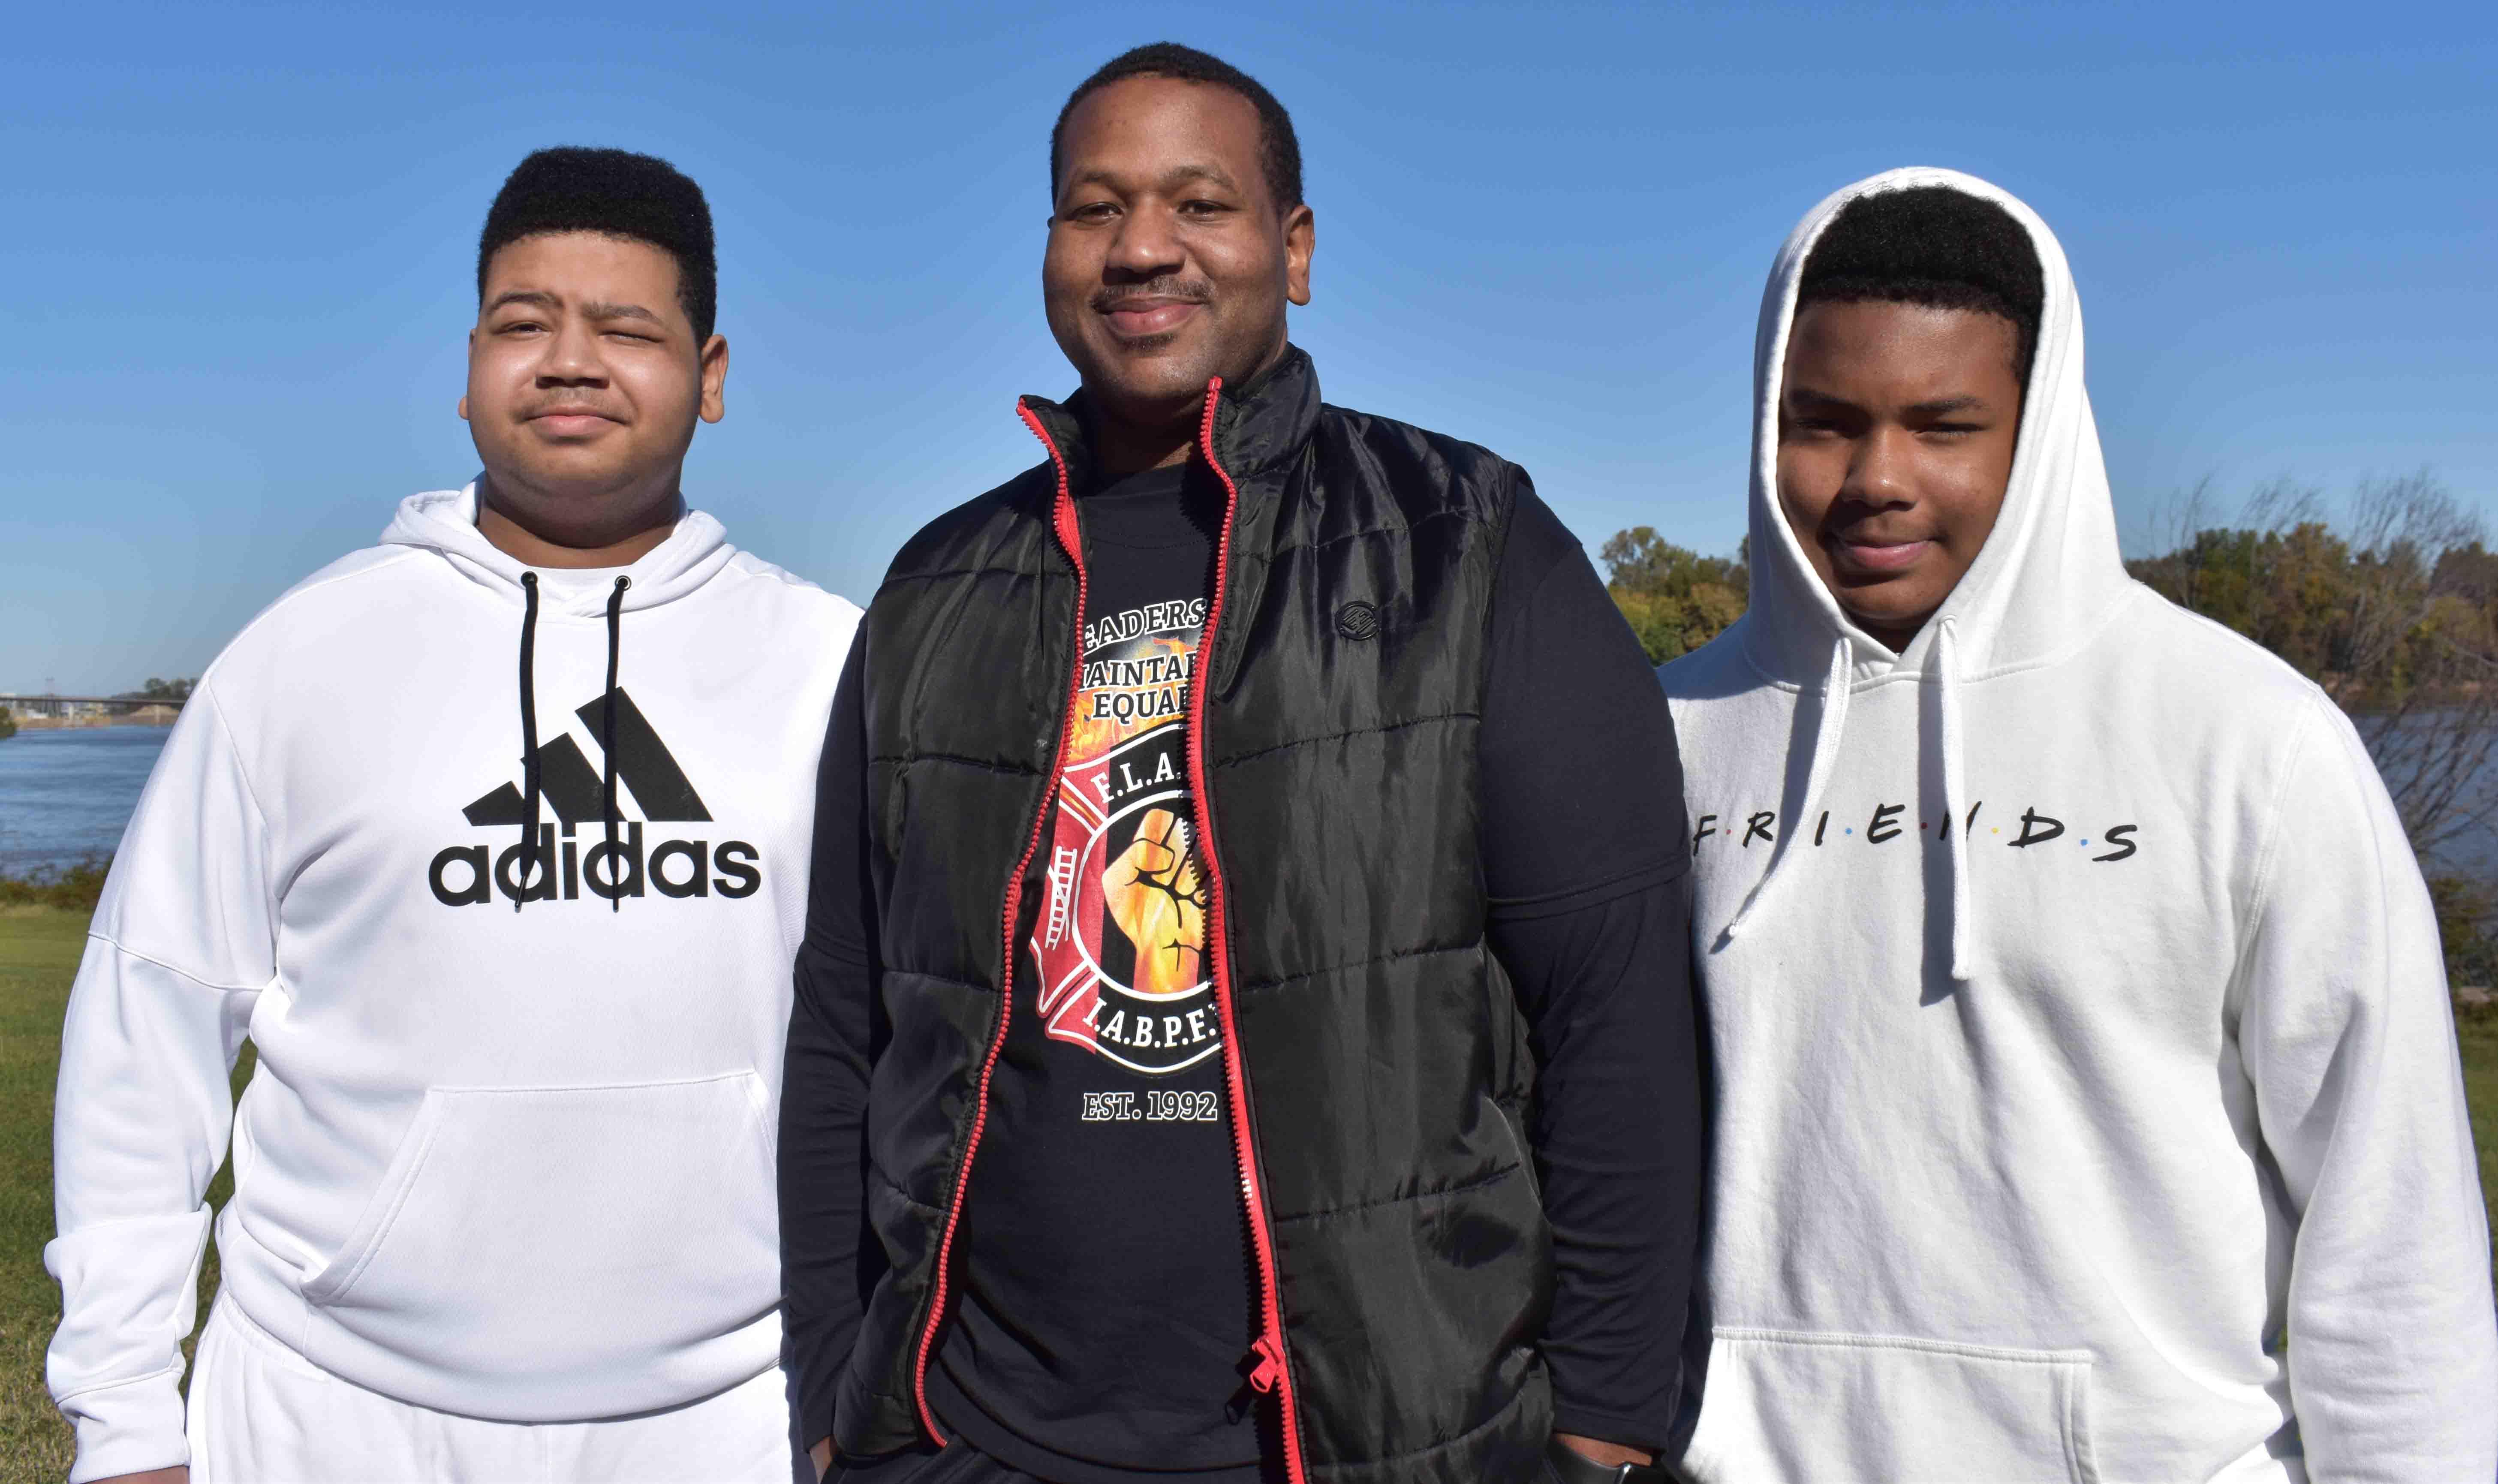 Zavier, Eric, and Zylin Hilldreth